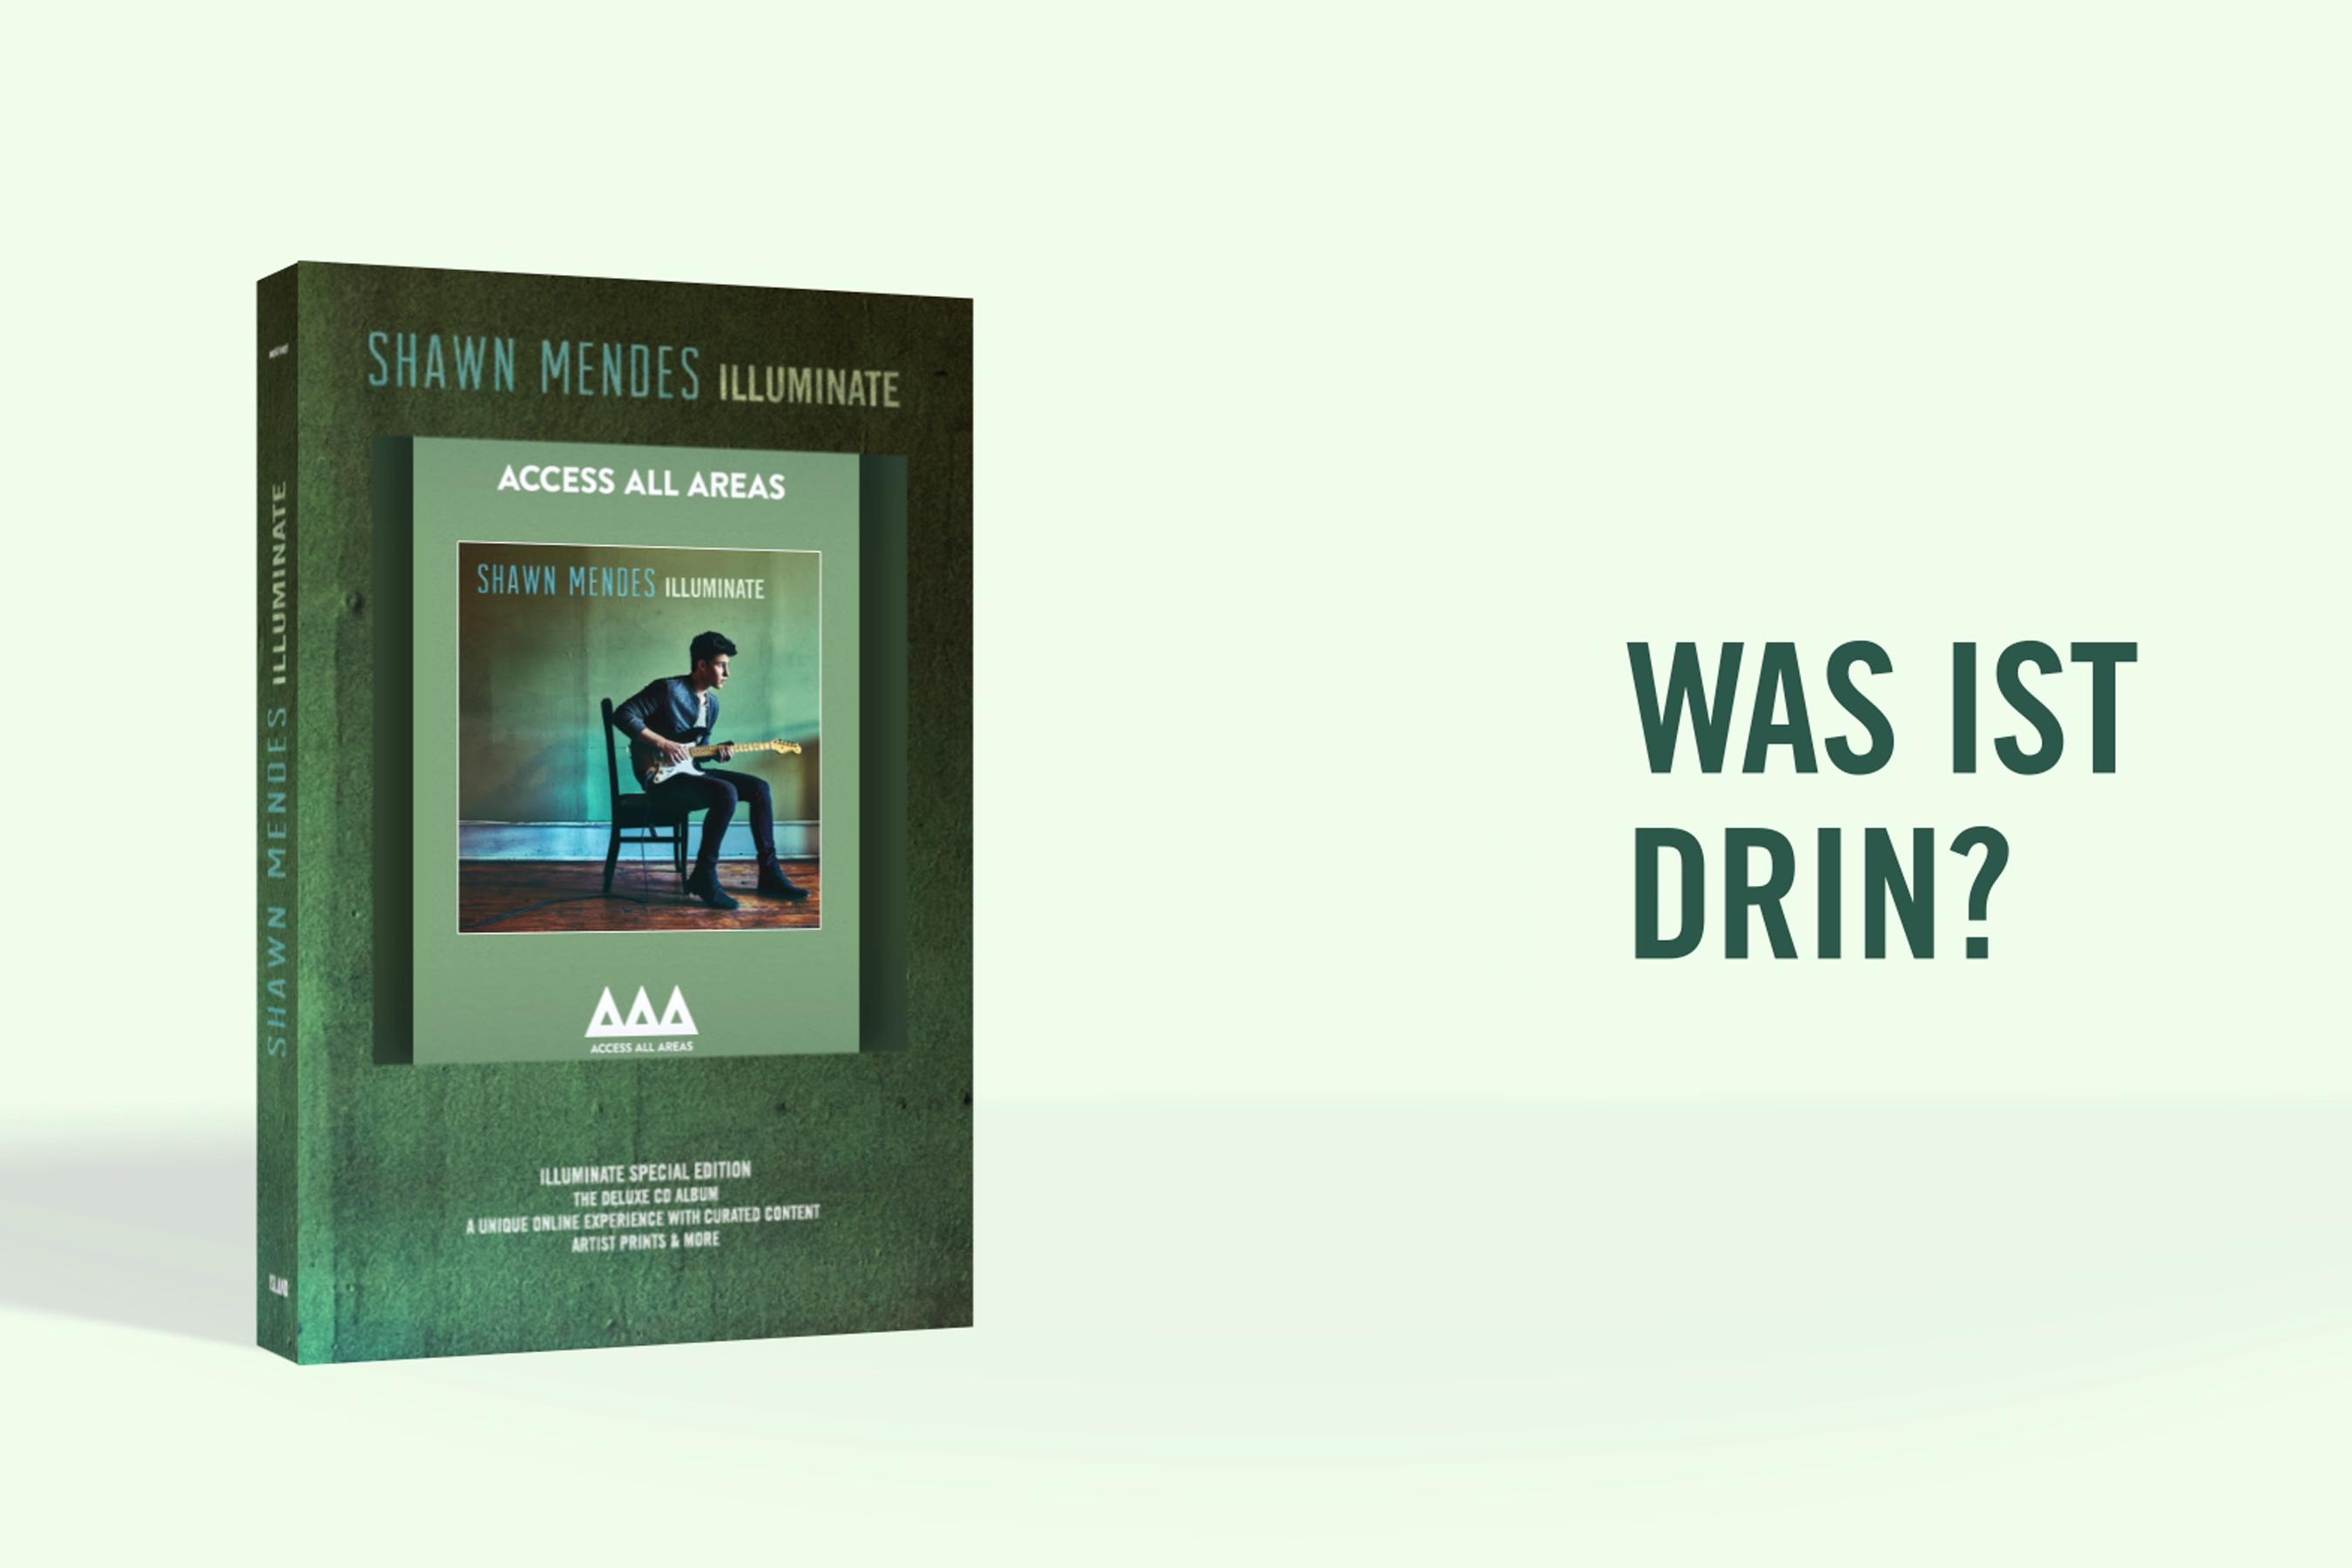 Shawn Mendes, Illuminate Special Edition Box